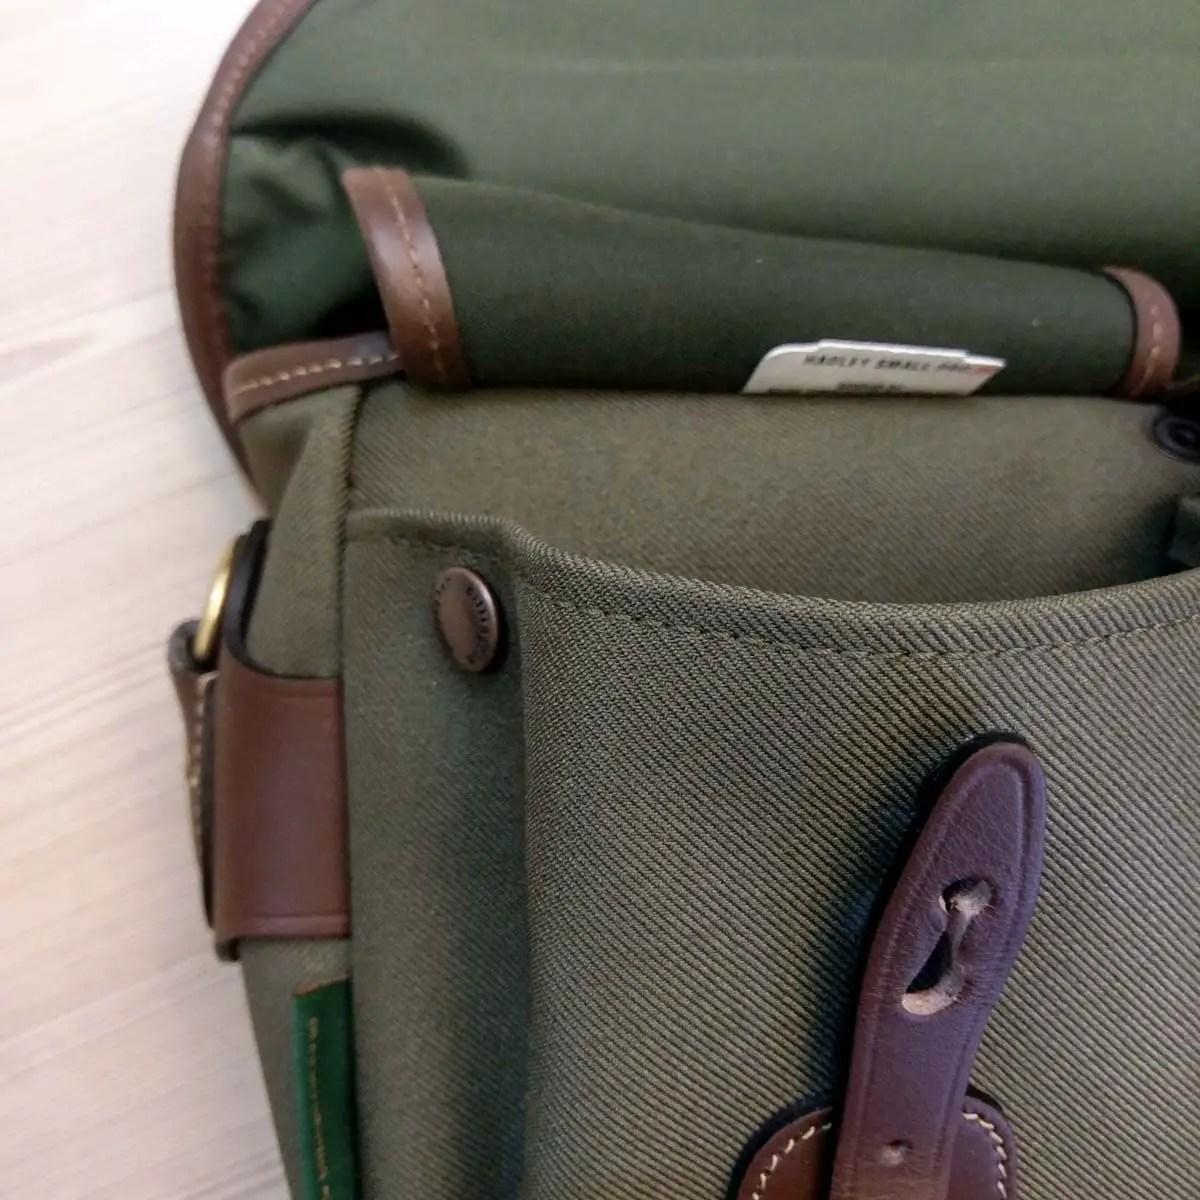 Billingham Hadley Small Pro - Dump pocket button open 01